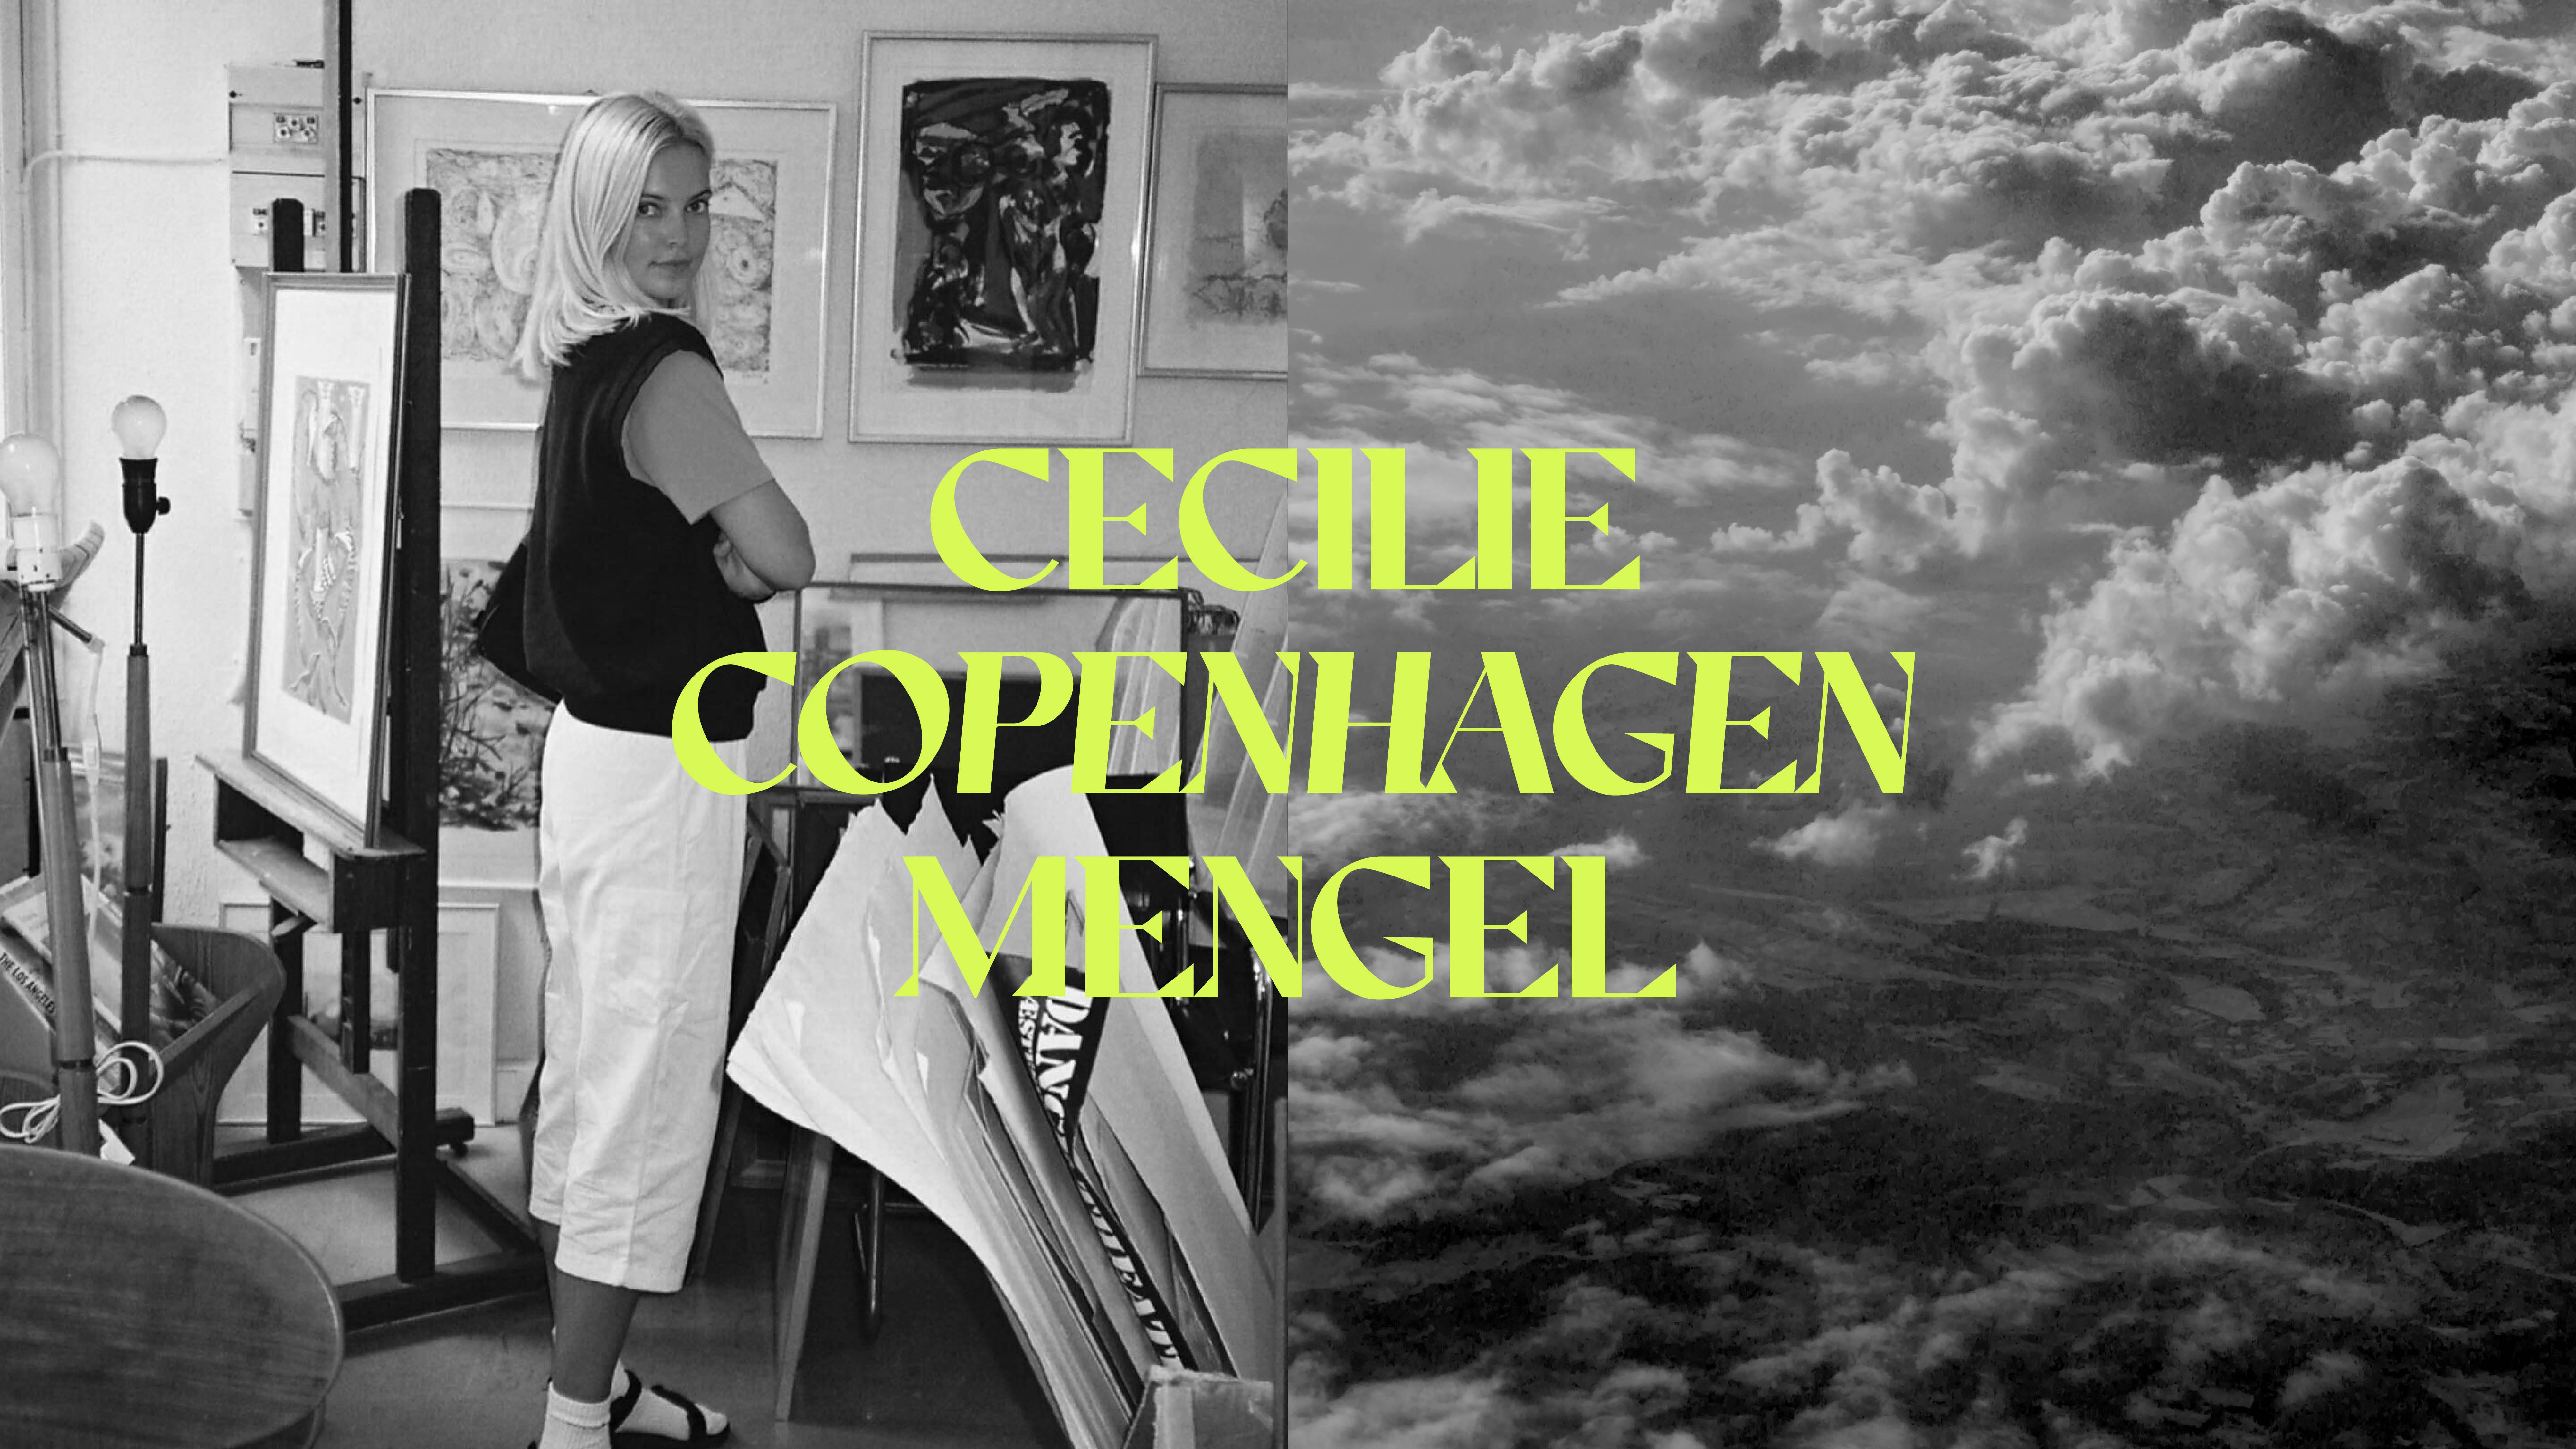 Cecilie Mengel